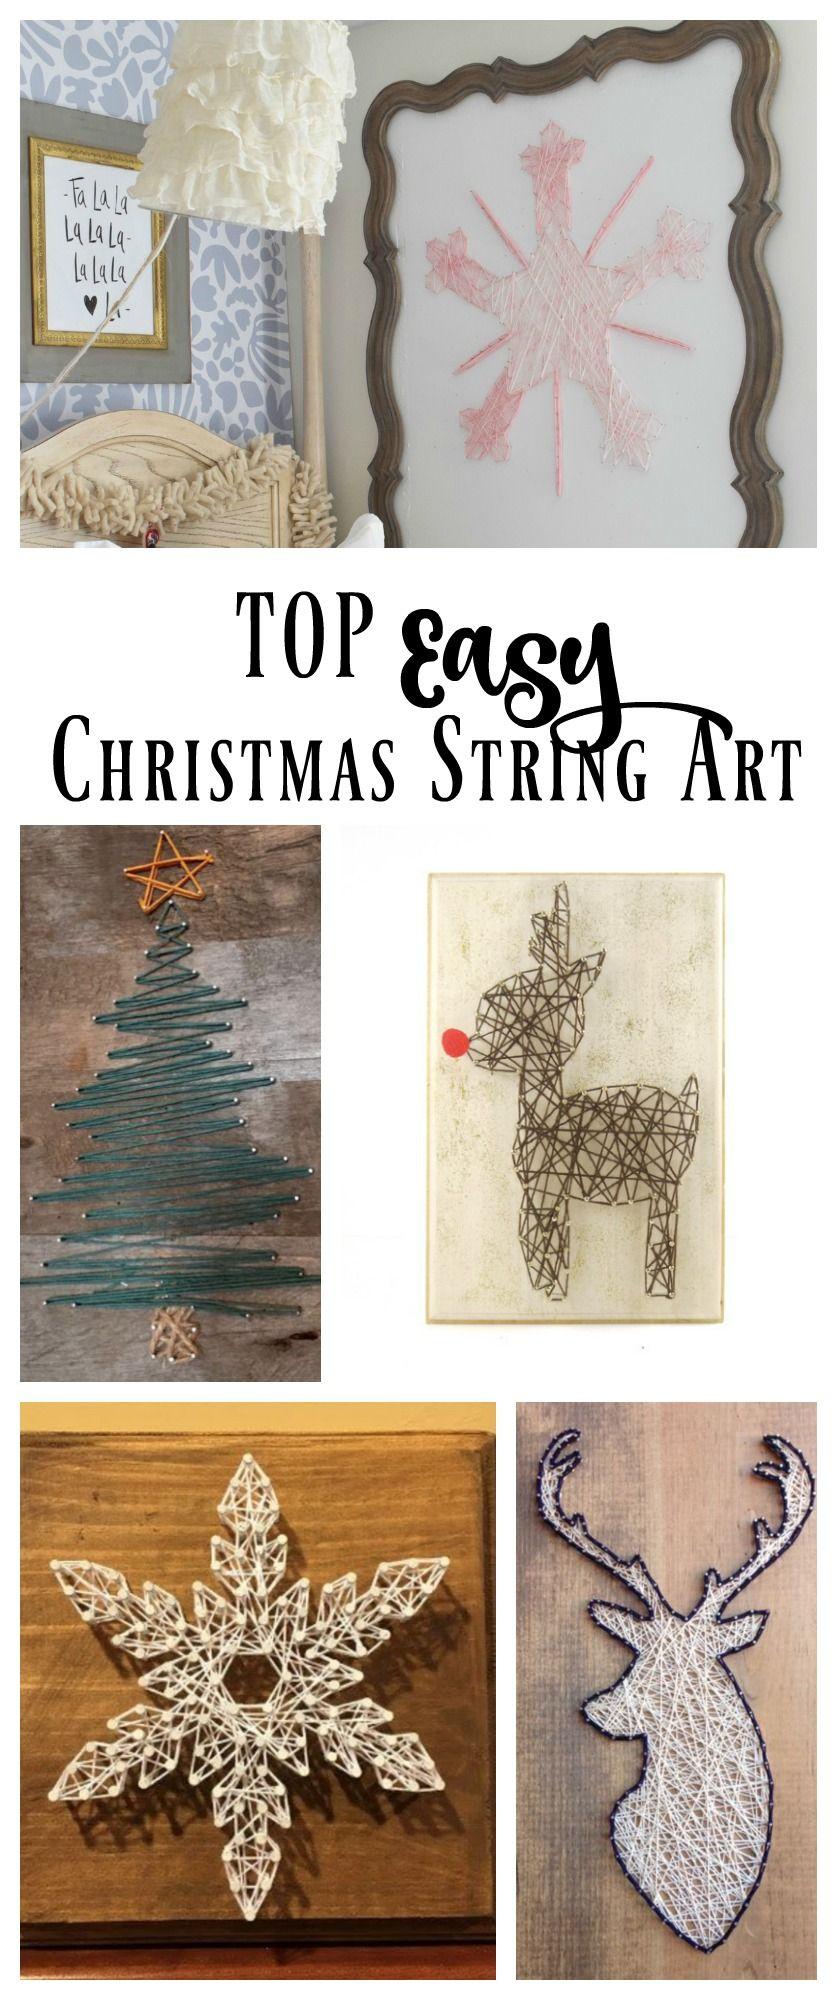 New String Art- For Christmas | Nagelbilder, Fadenbilder und Faden